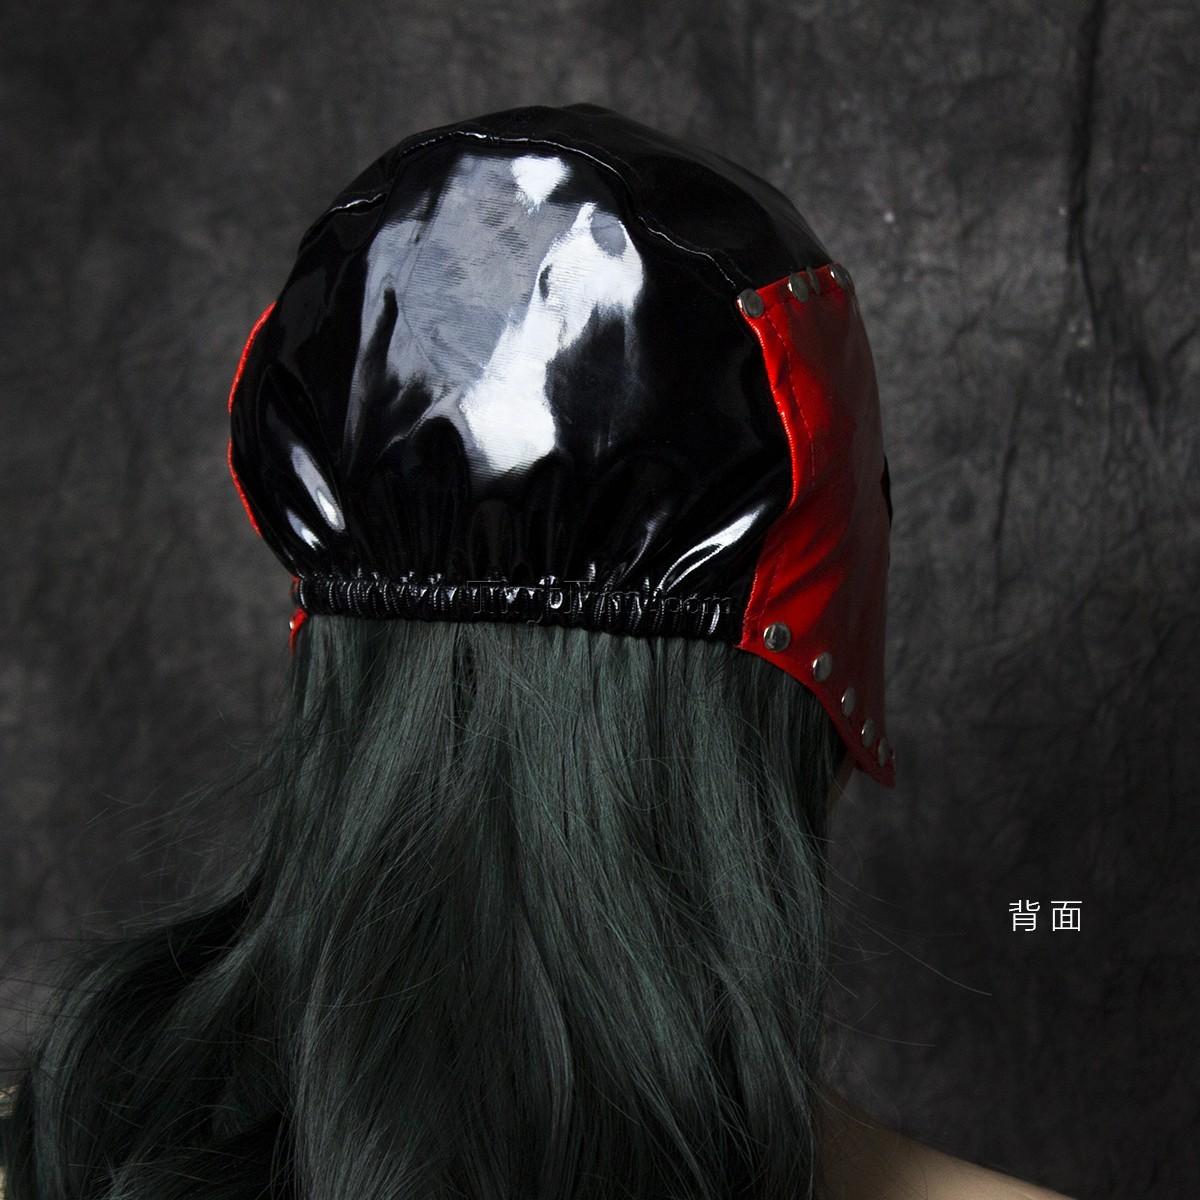 13-Masked-Queen-Cap-3.jpg